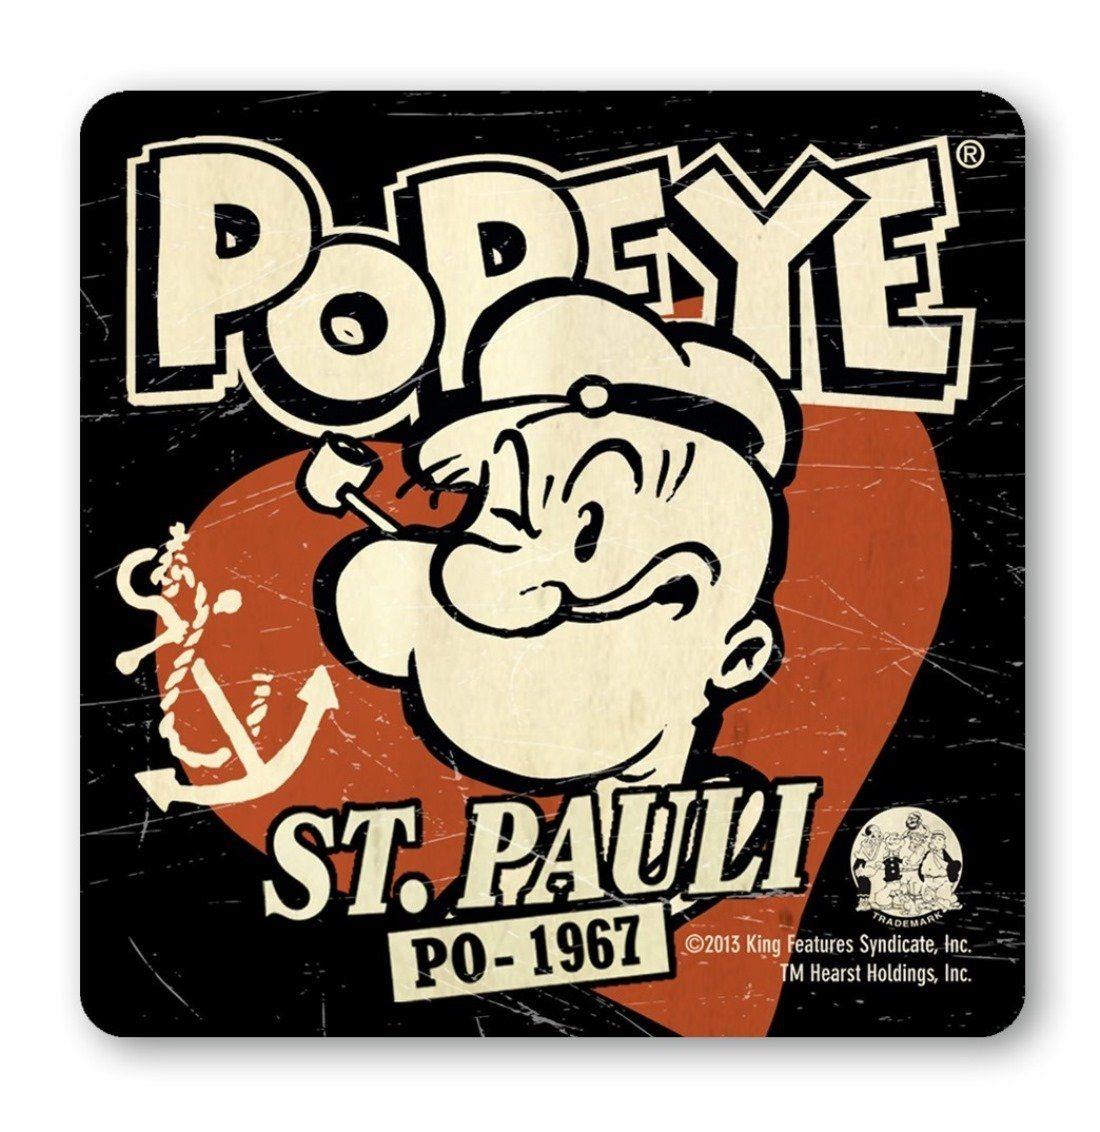 LOGOSHIRT Untersetzer mit Popeye-Logo in Retro-Optik